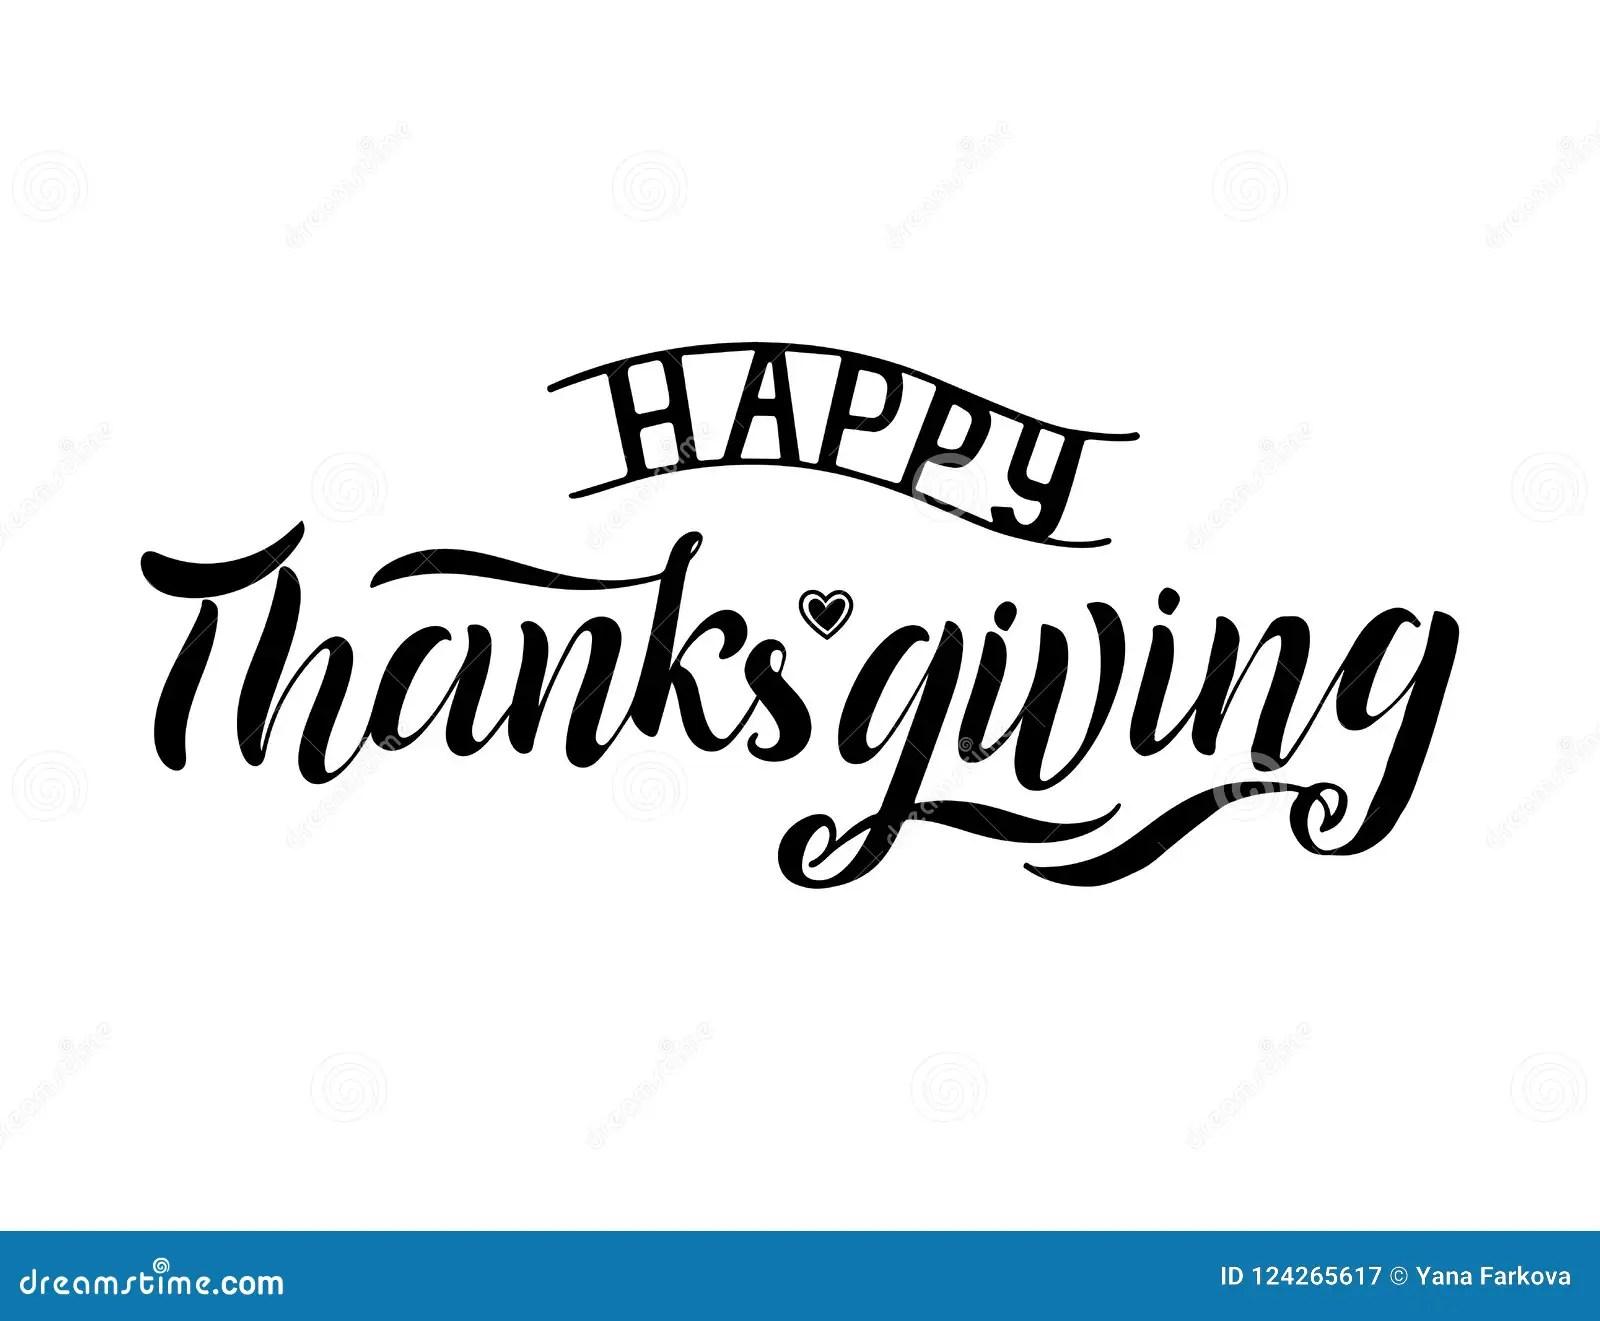 Thanksgiving Day Sketch Doodle Turkey In Pilgrims Hat